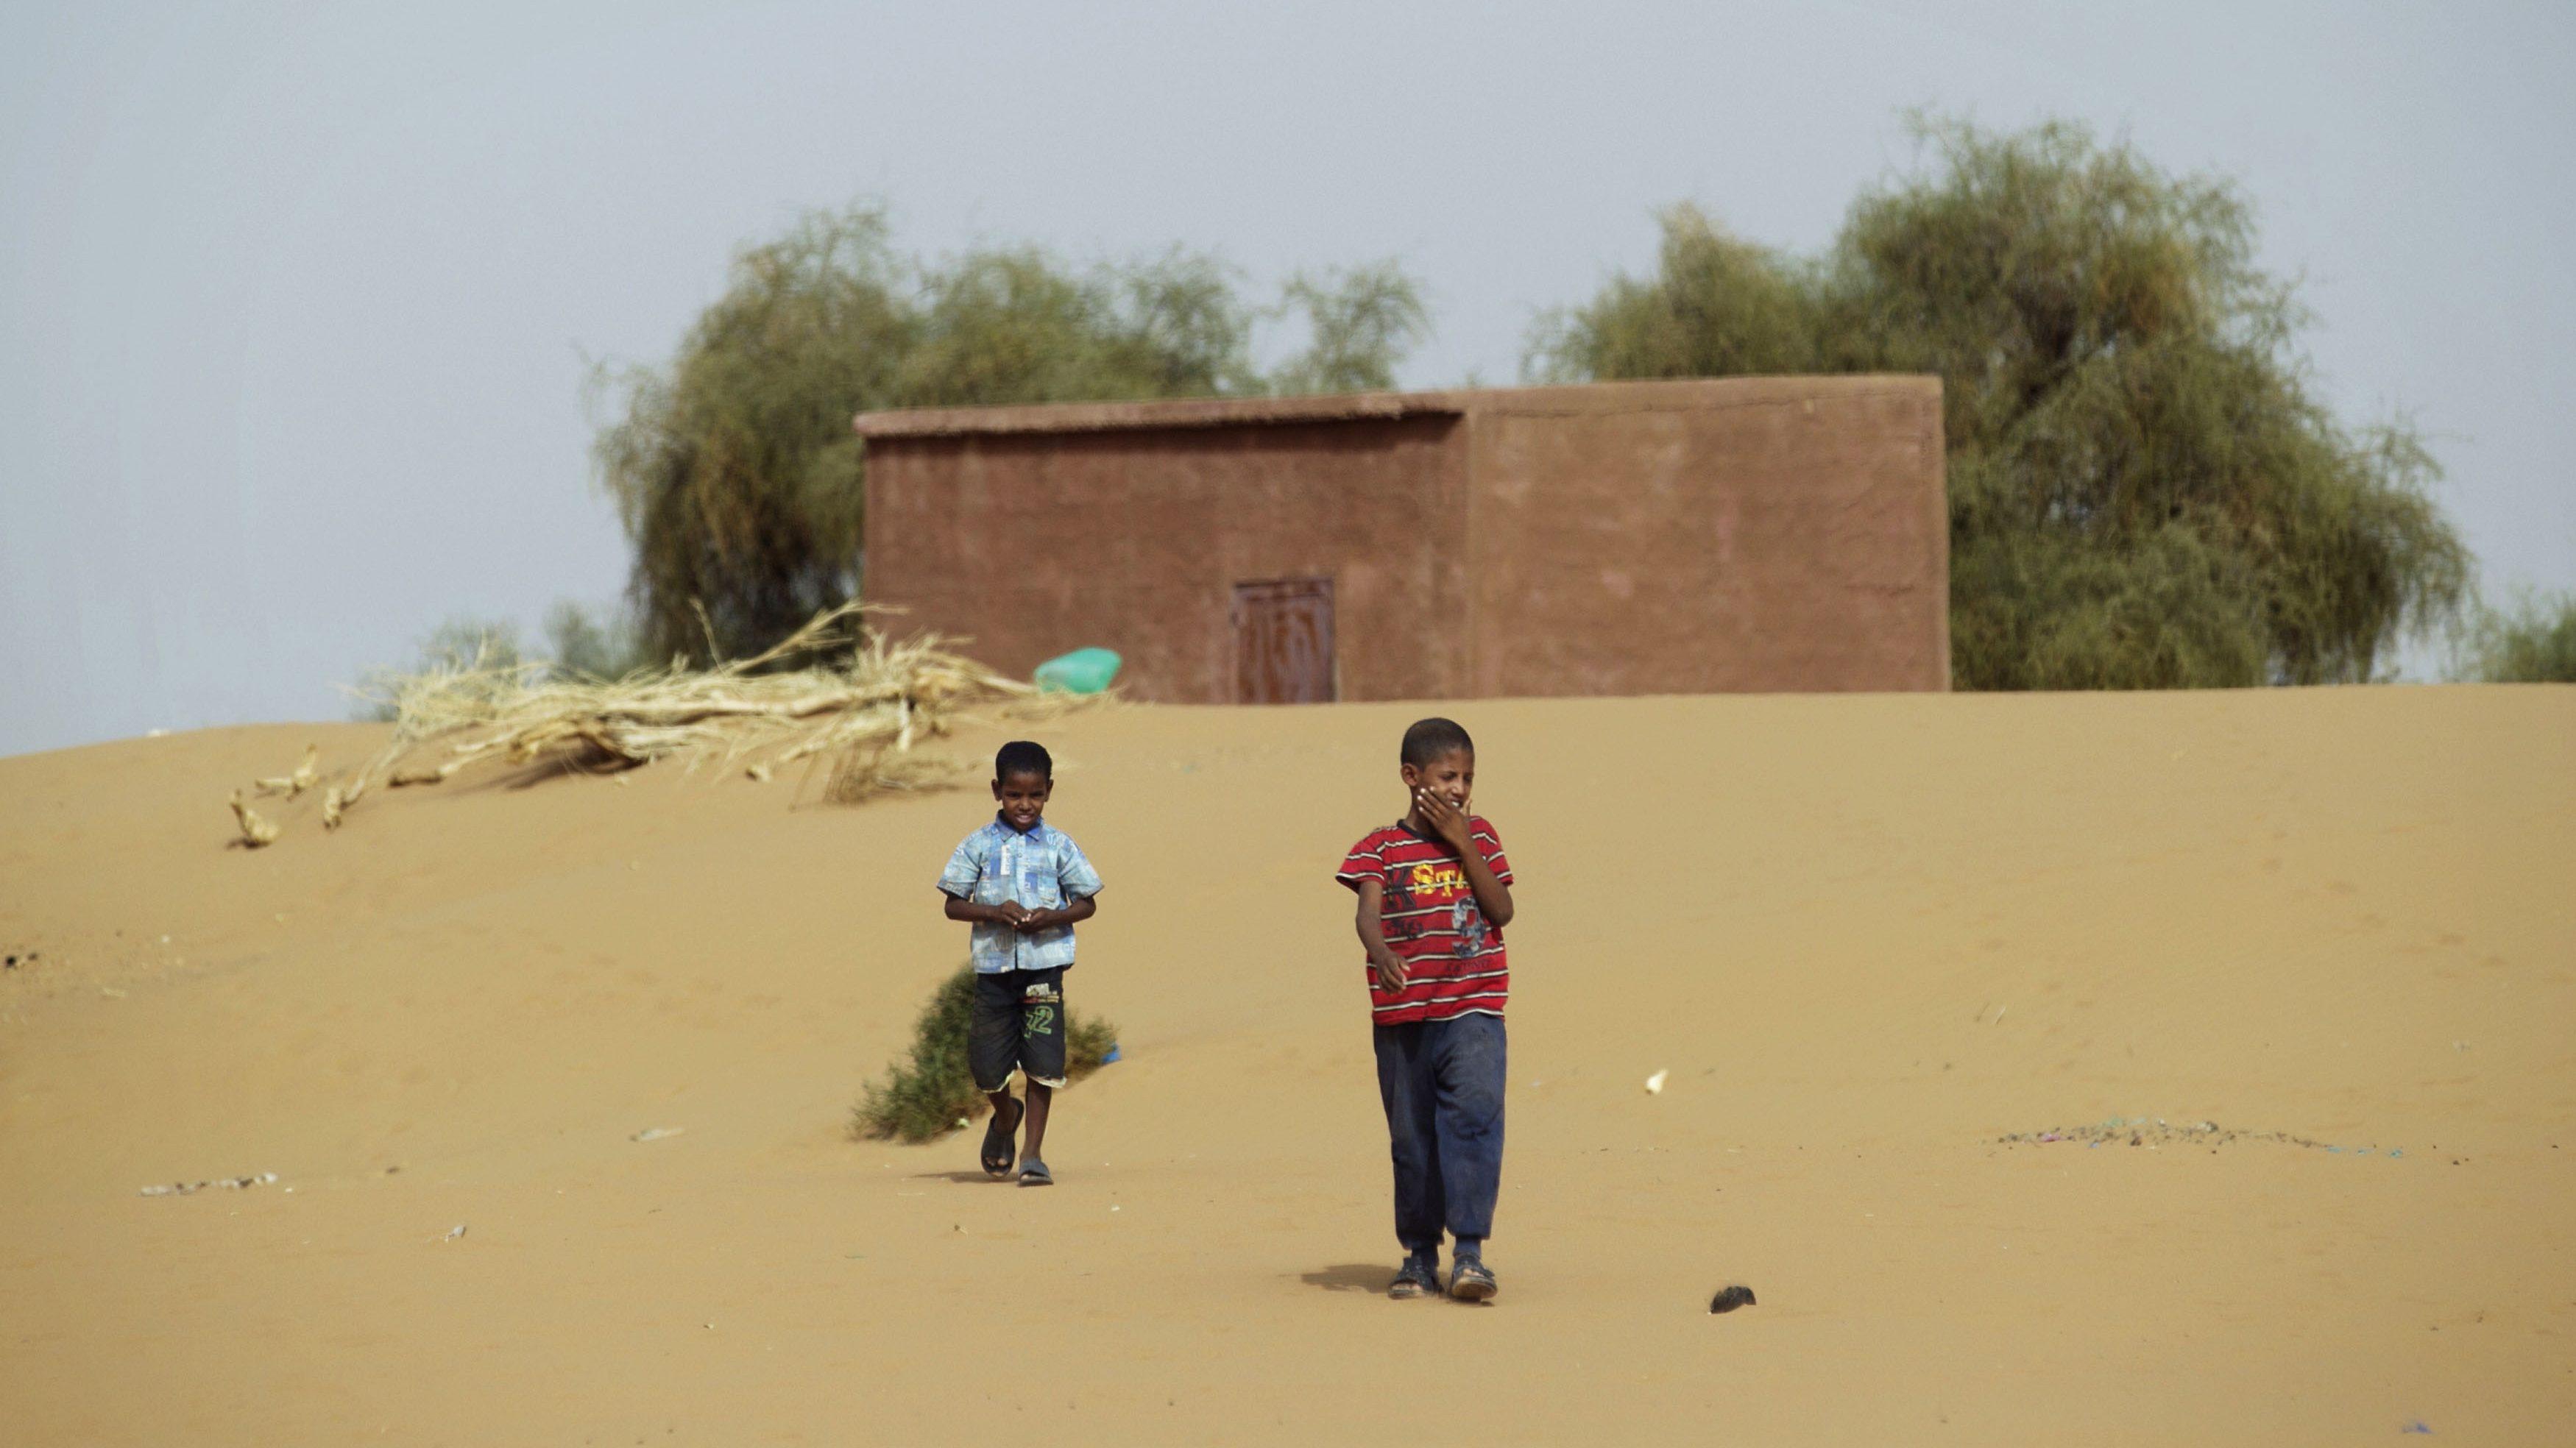 West Africa's Sahel vulnerable to climate change, bad governance - Quartz Africa